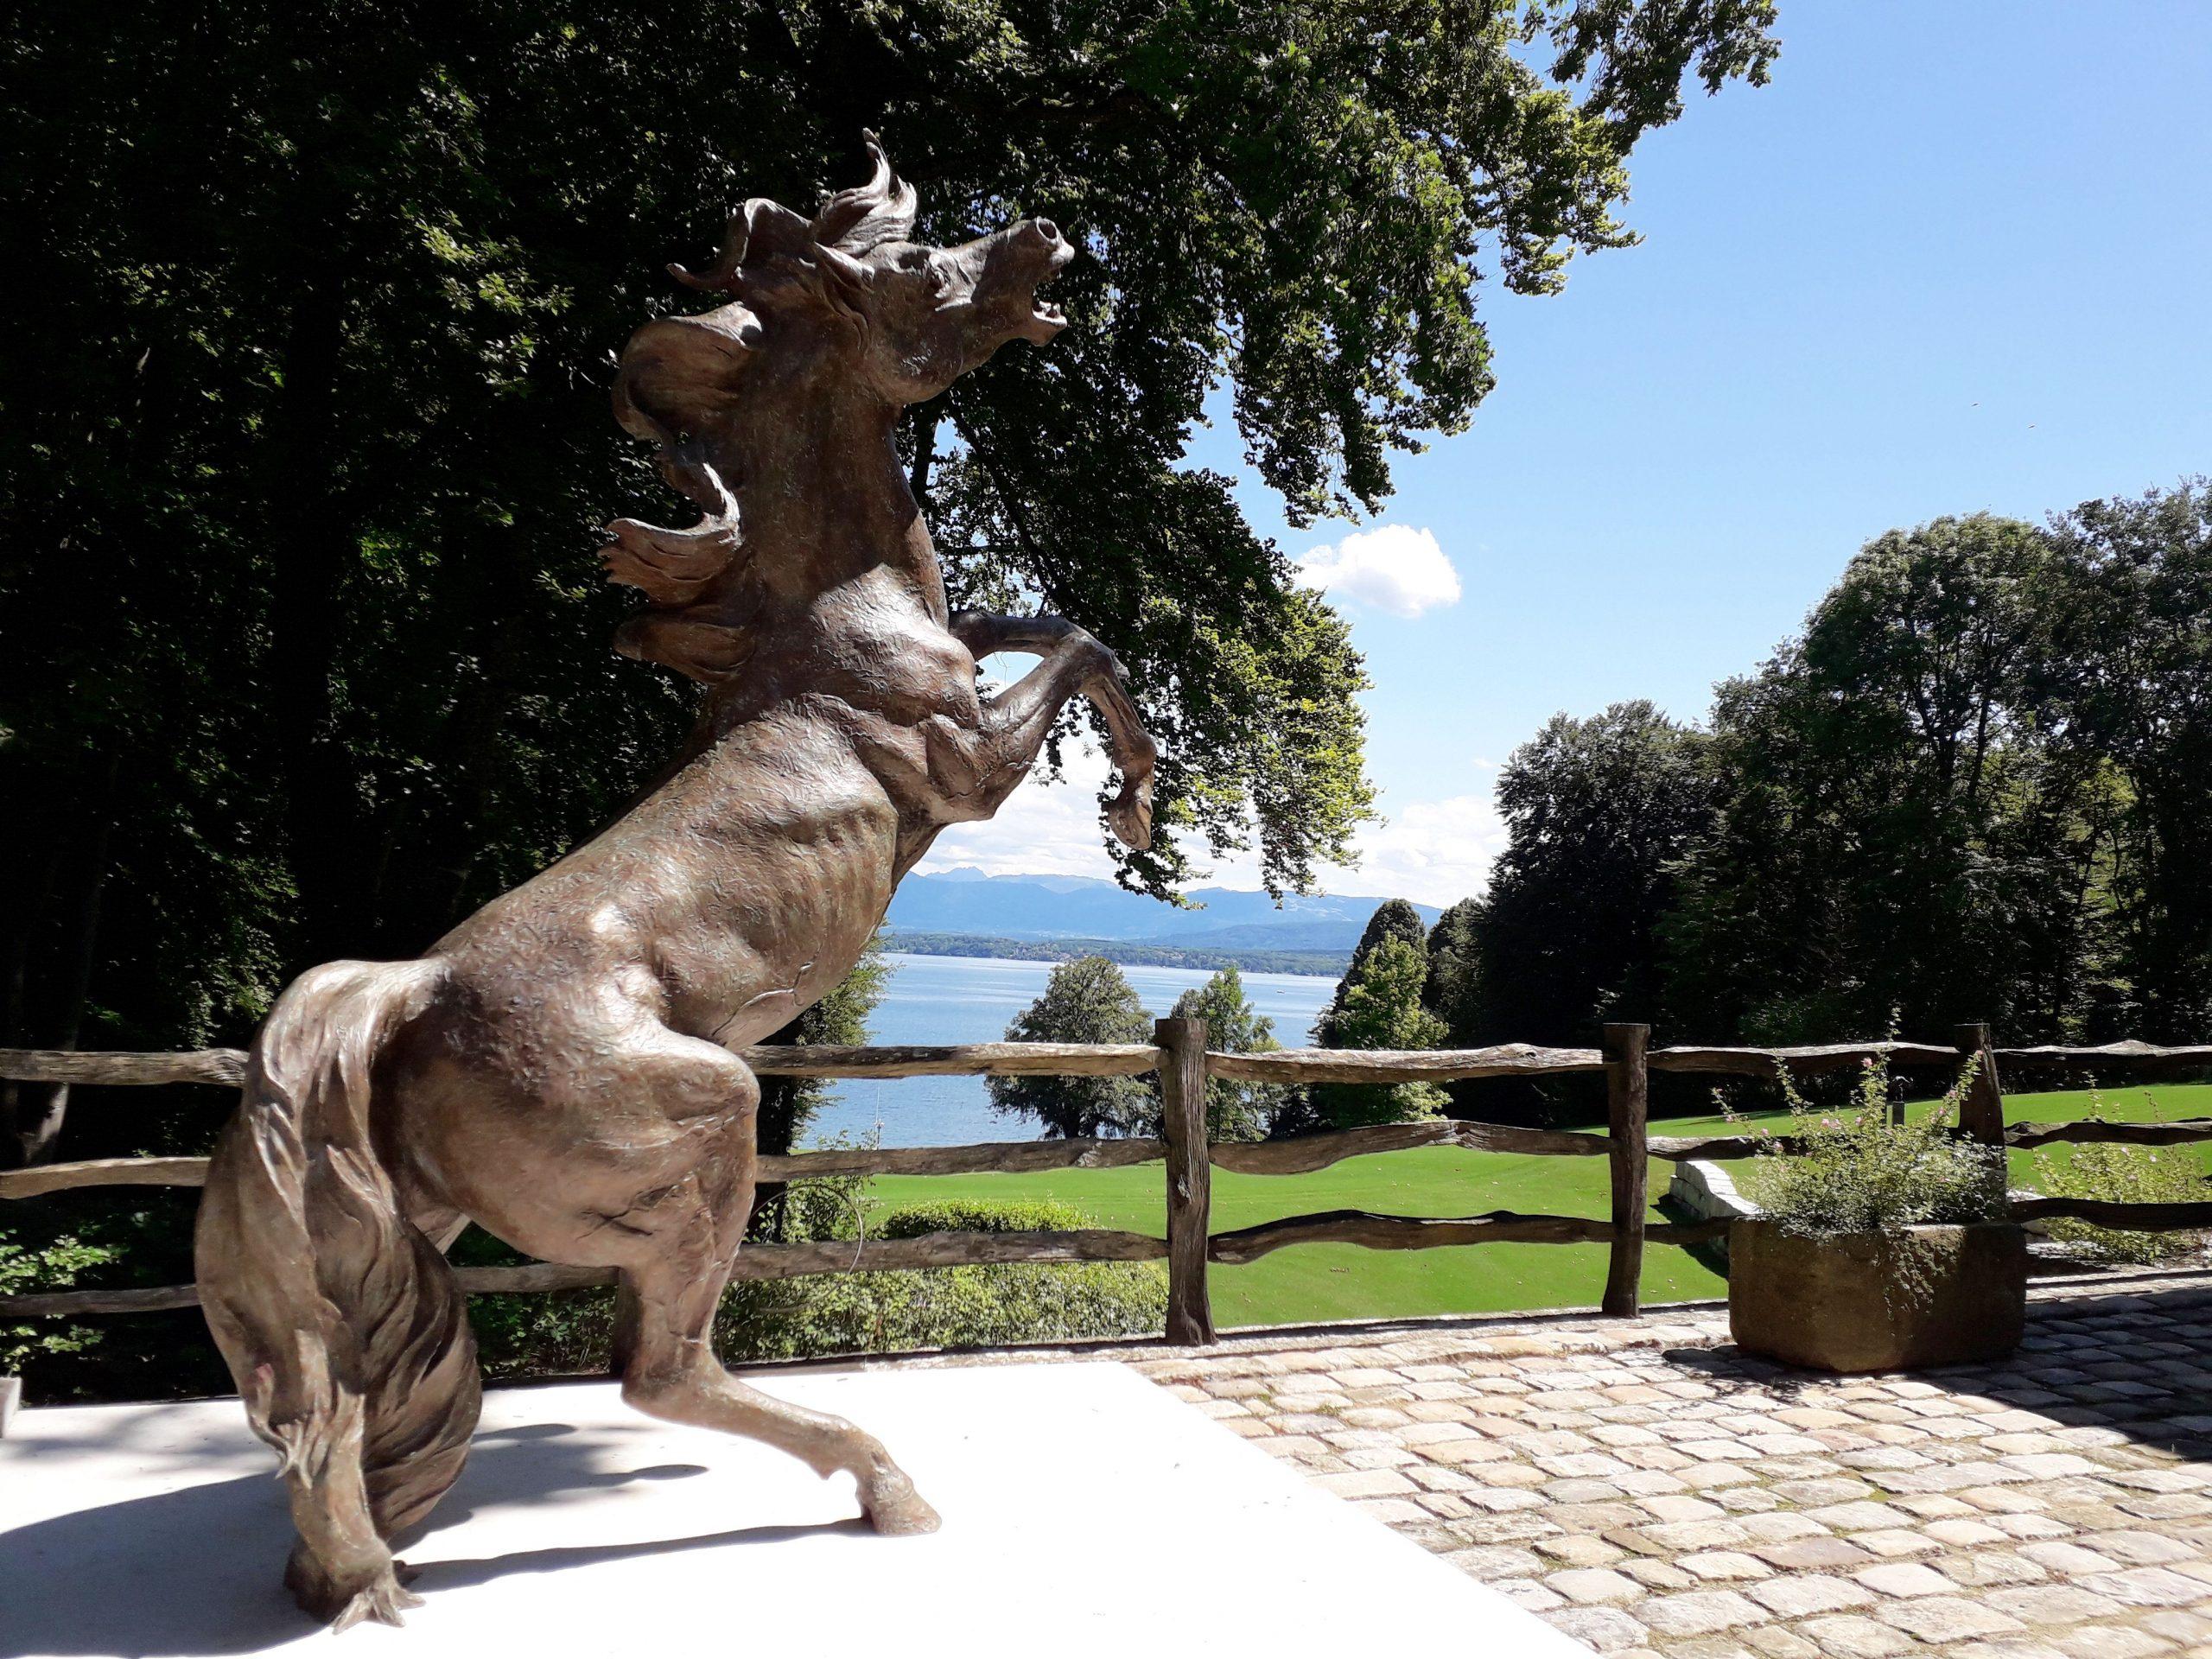 bronze-horse-custom-sculptures-life-size-statuette-for-sale-04